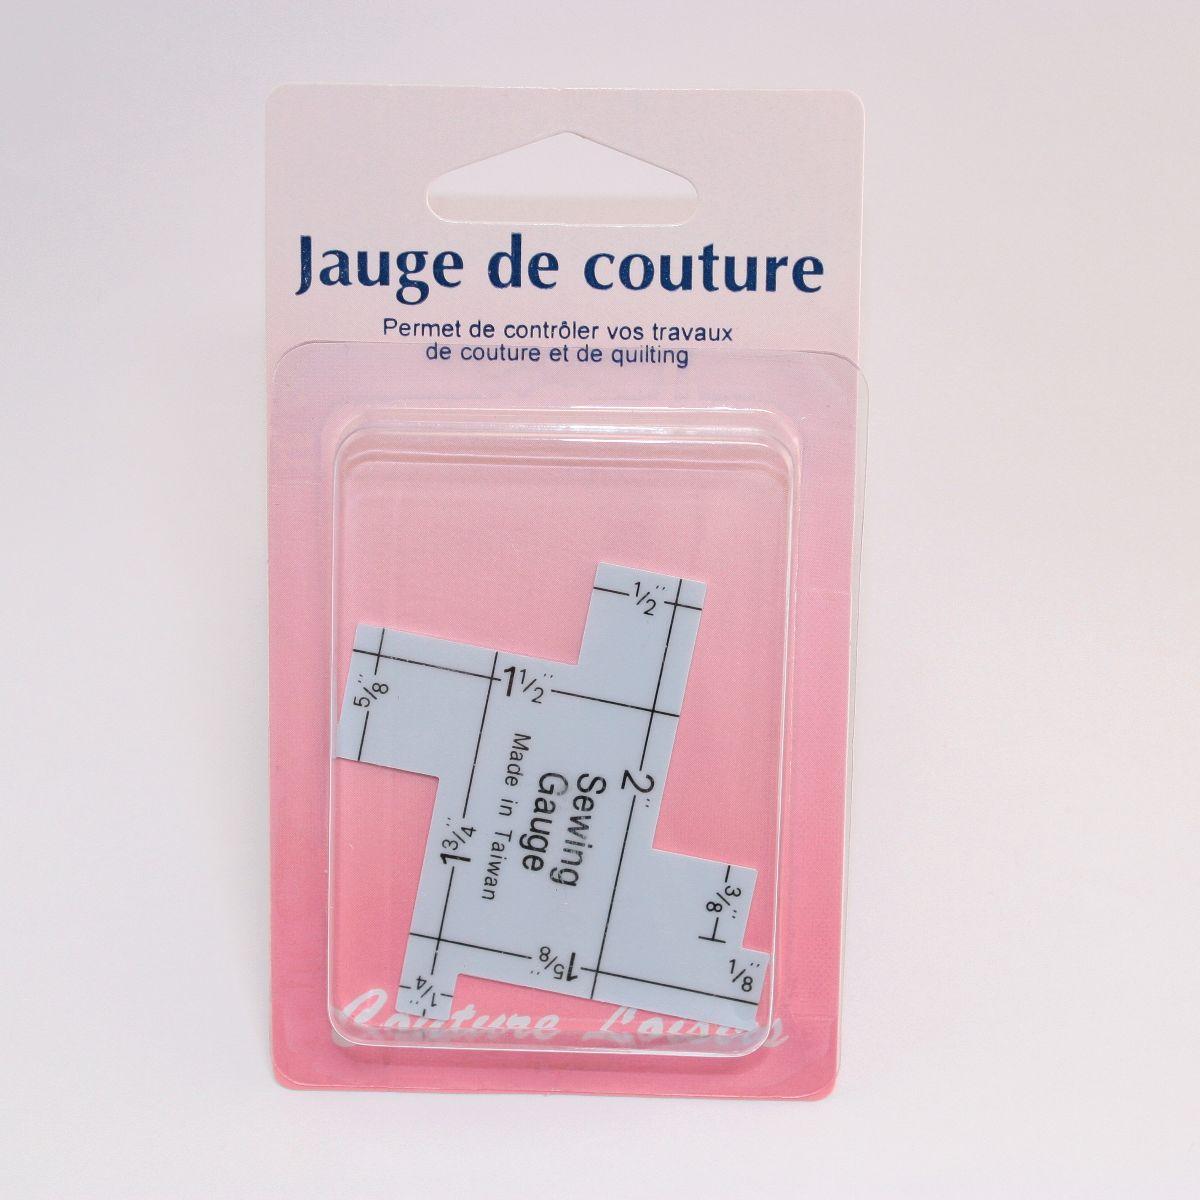 Jauge de couture